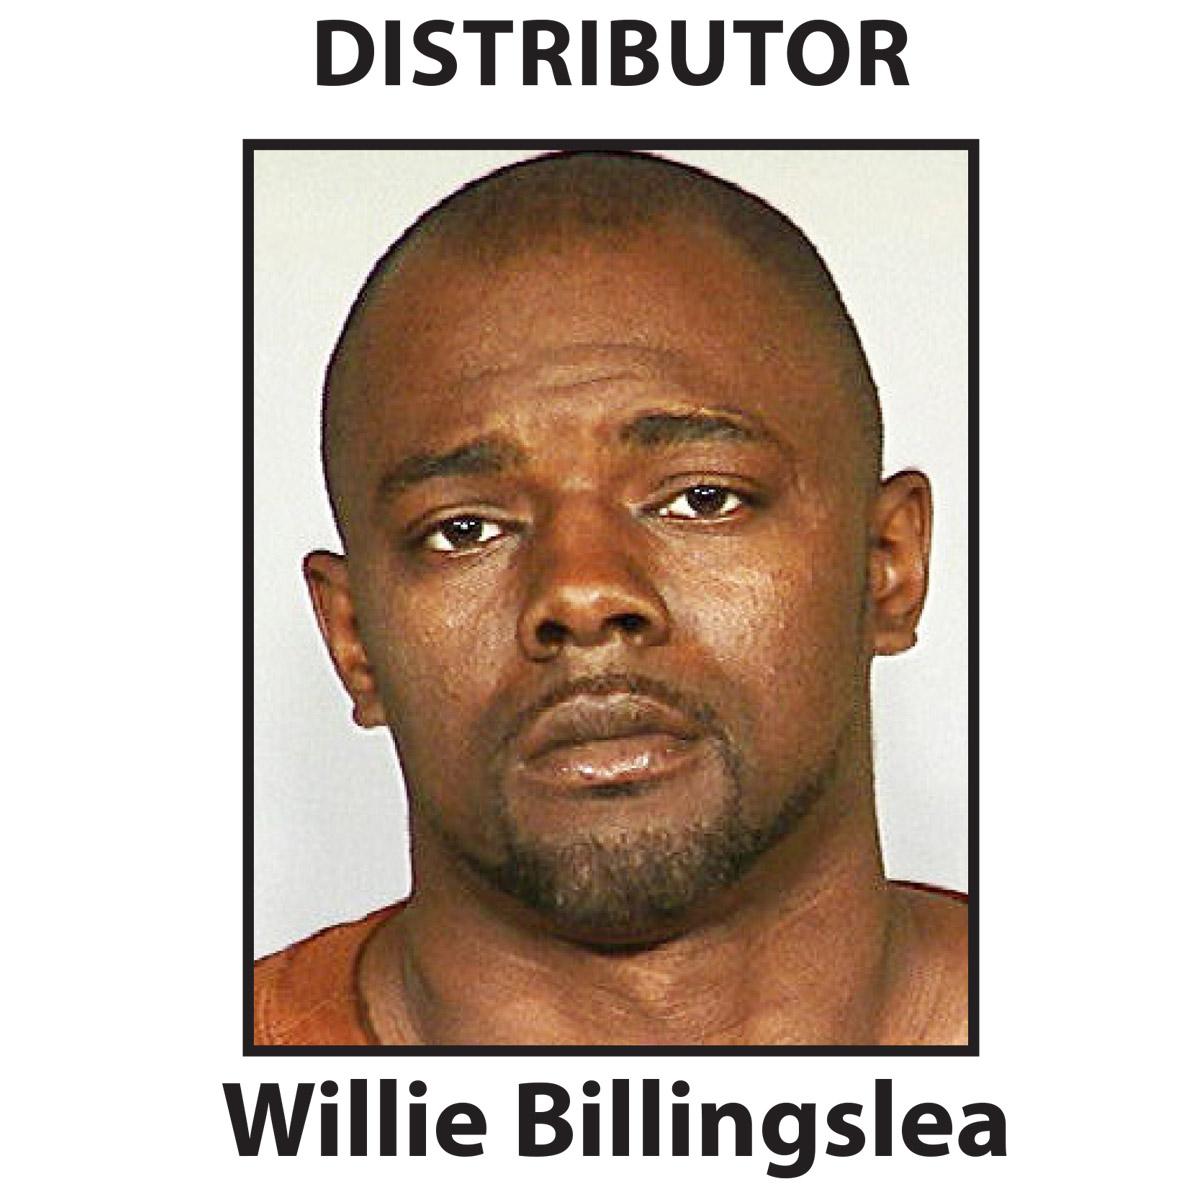 <div class='meta'><div class='origin-logo' data-origin='none'></div><span class='caption-text' data-credit=''>Willie Billingslea</span></div>